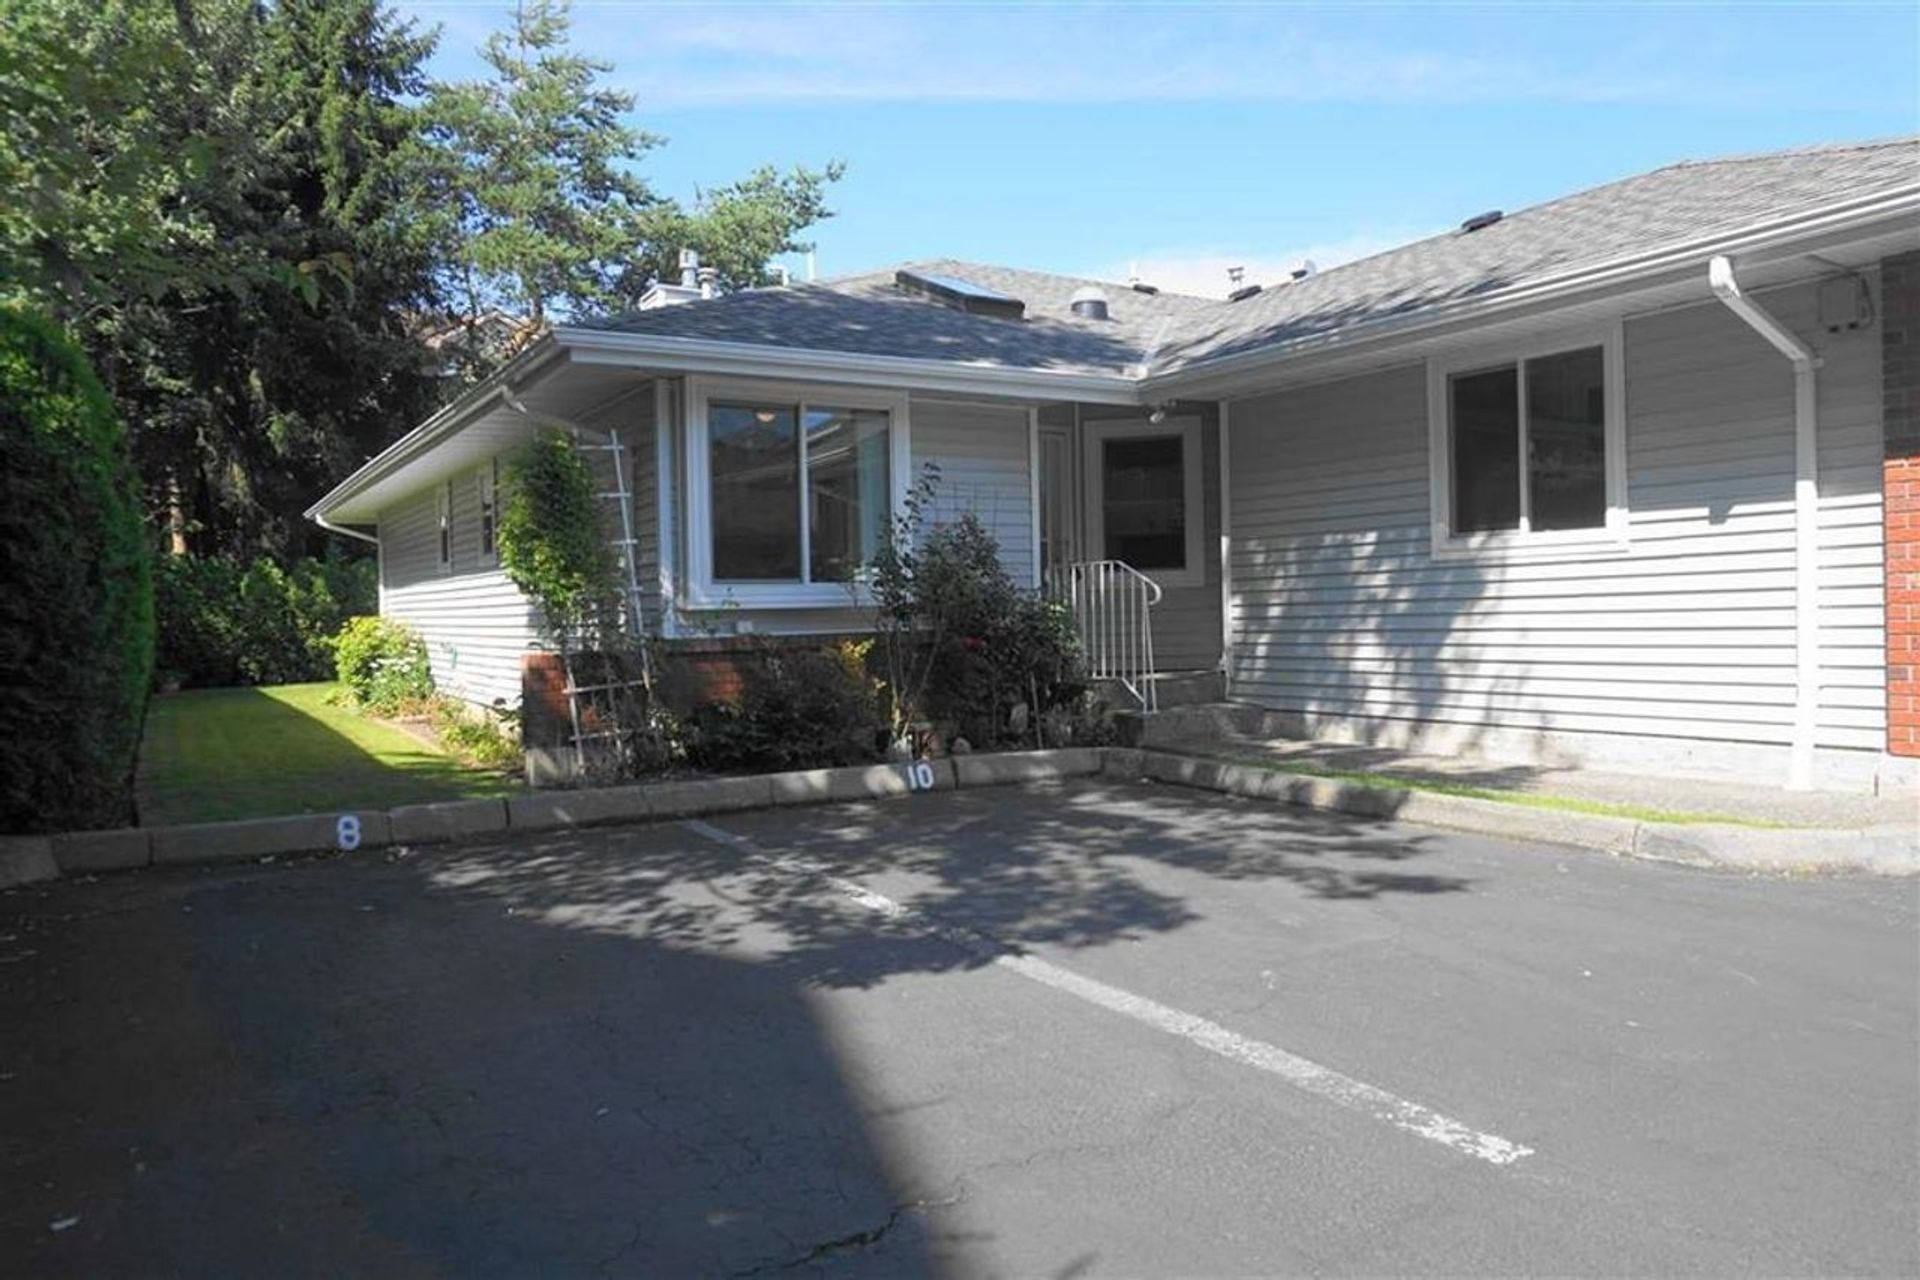 10 - 5365 205 Street, Langley City, Langley